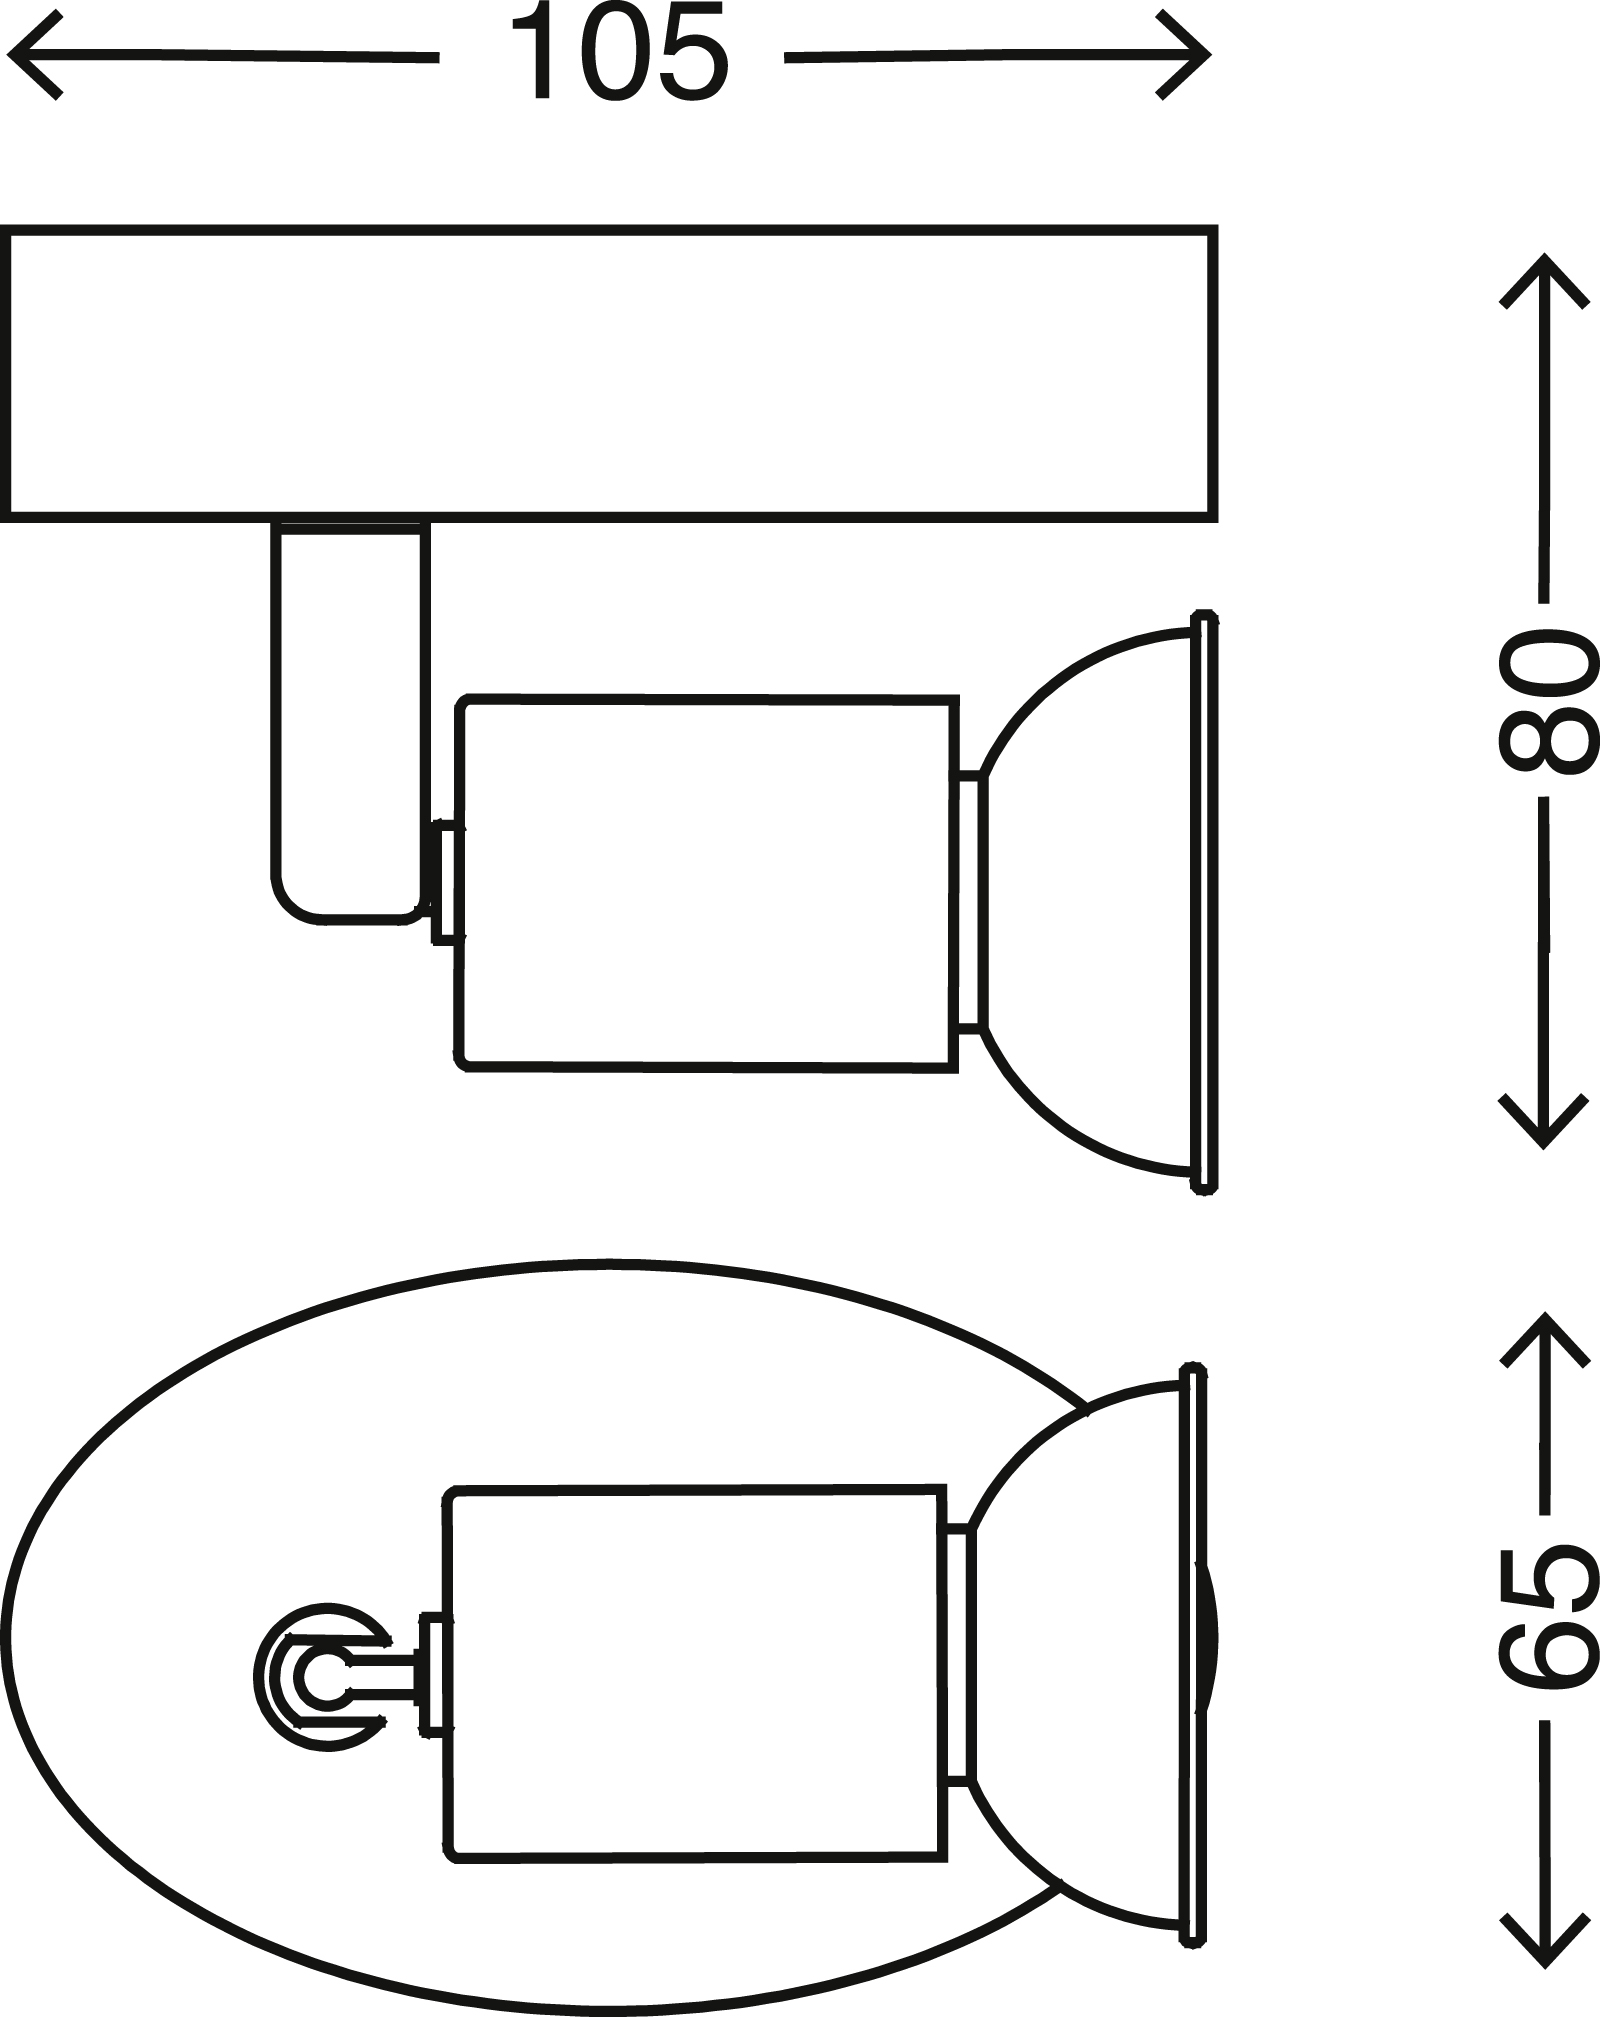 LED Spot Wandleuchte, 10,5 cm, 3 W, Weiß